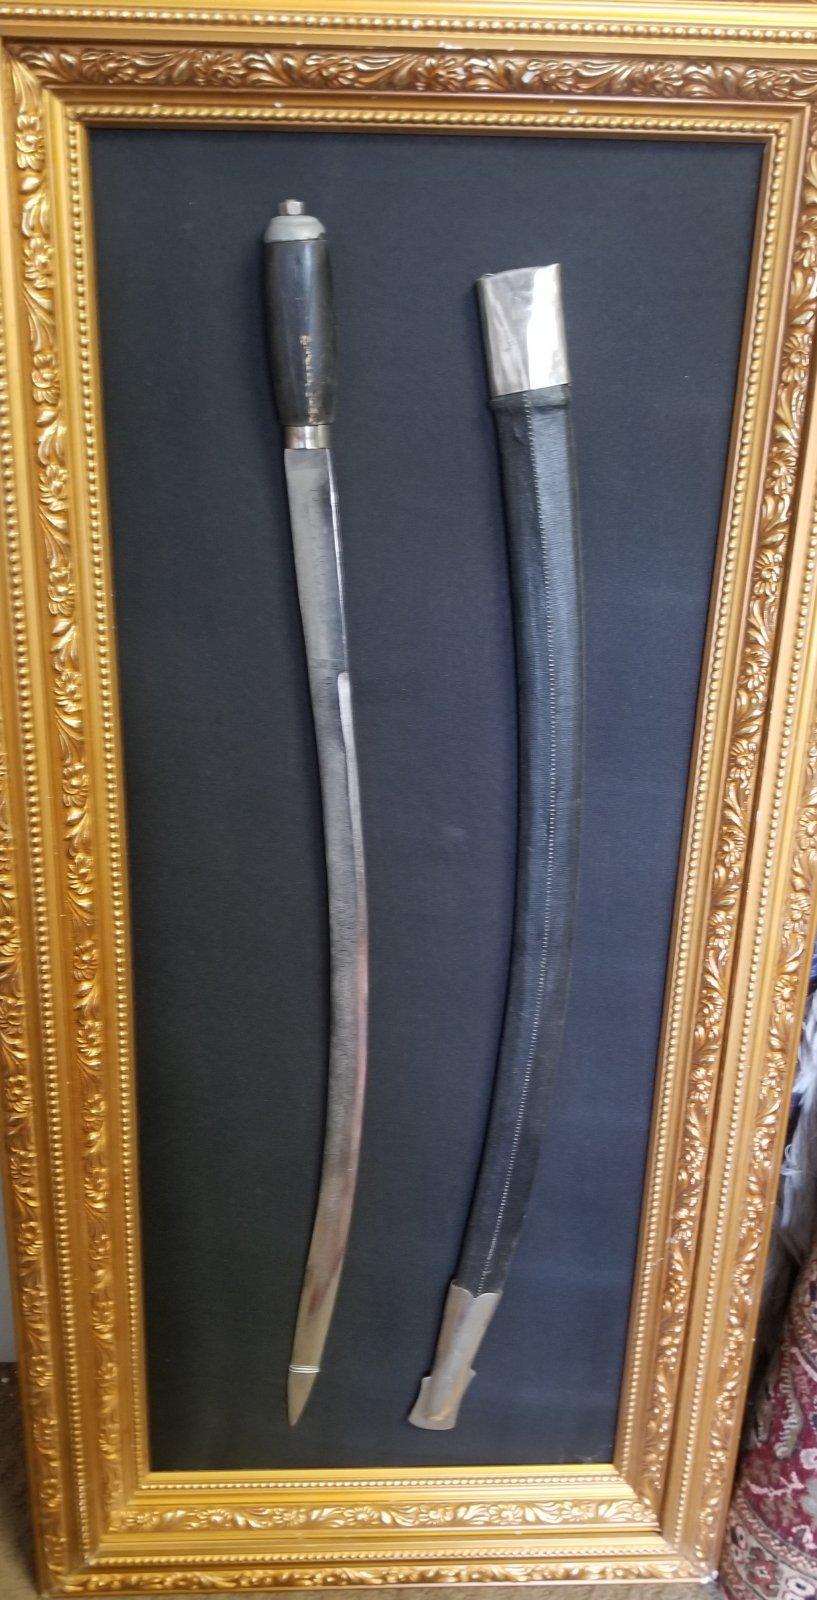 Saudi Arabian sword with sheath framed with no glass PPTX